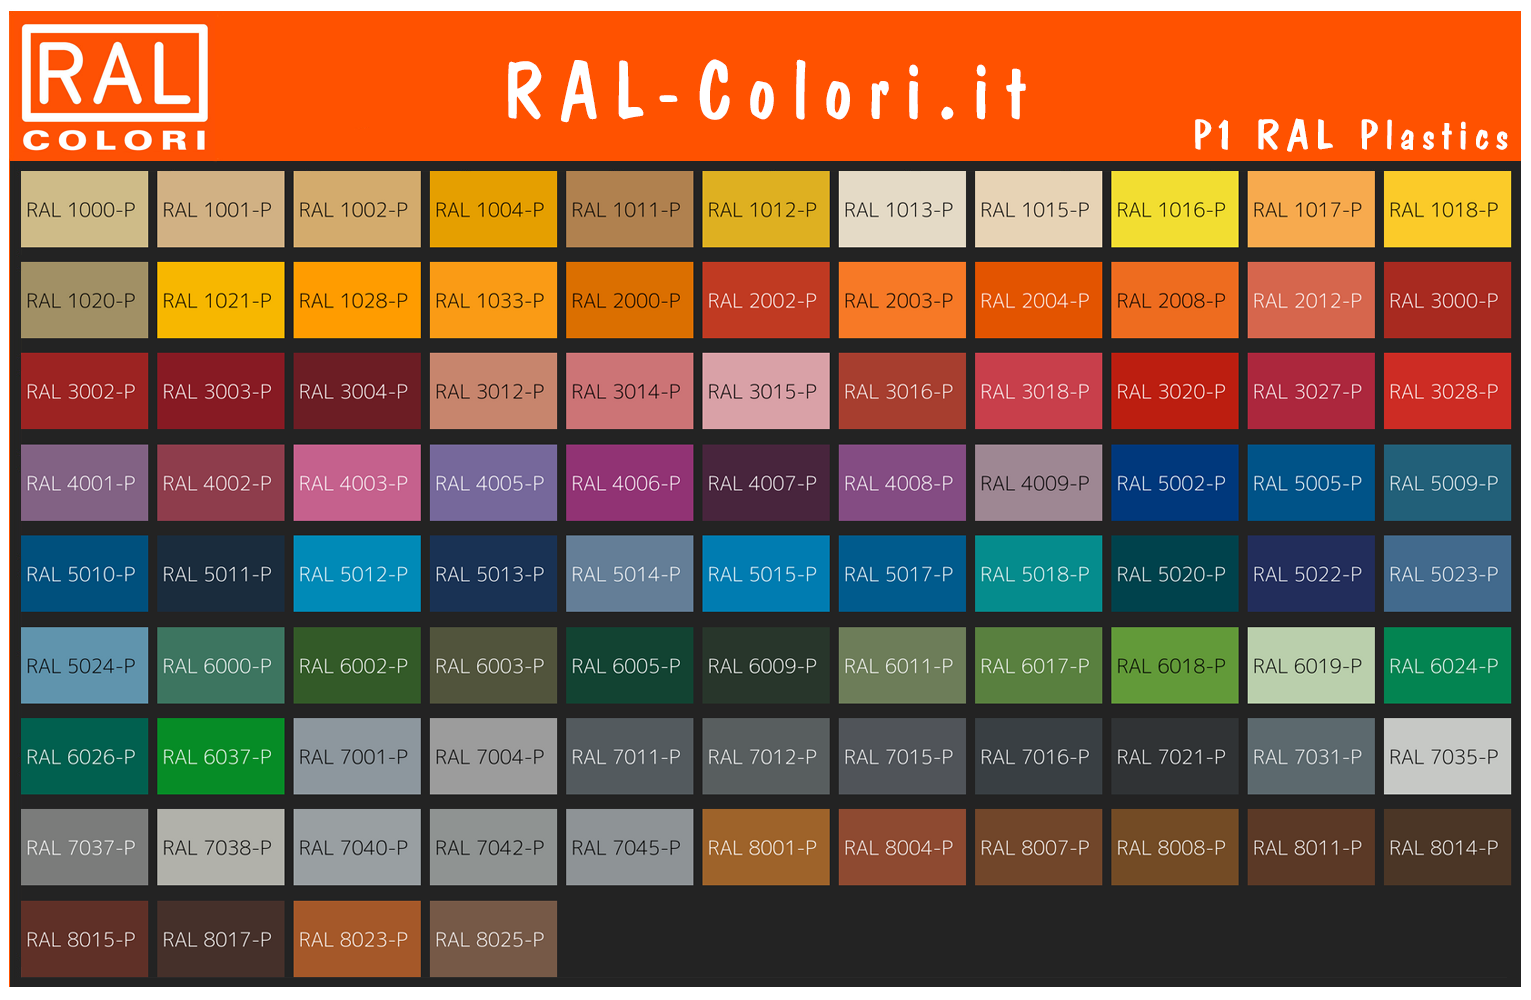 P1 RAL plastics cartella colori IT